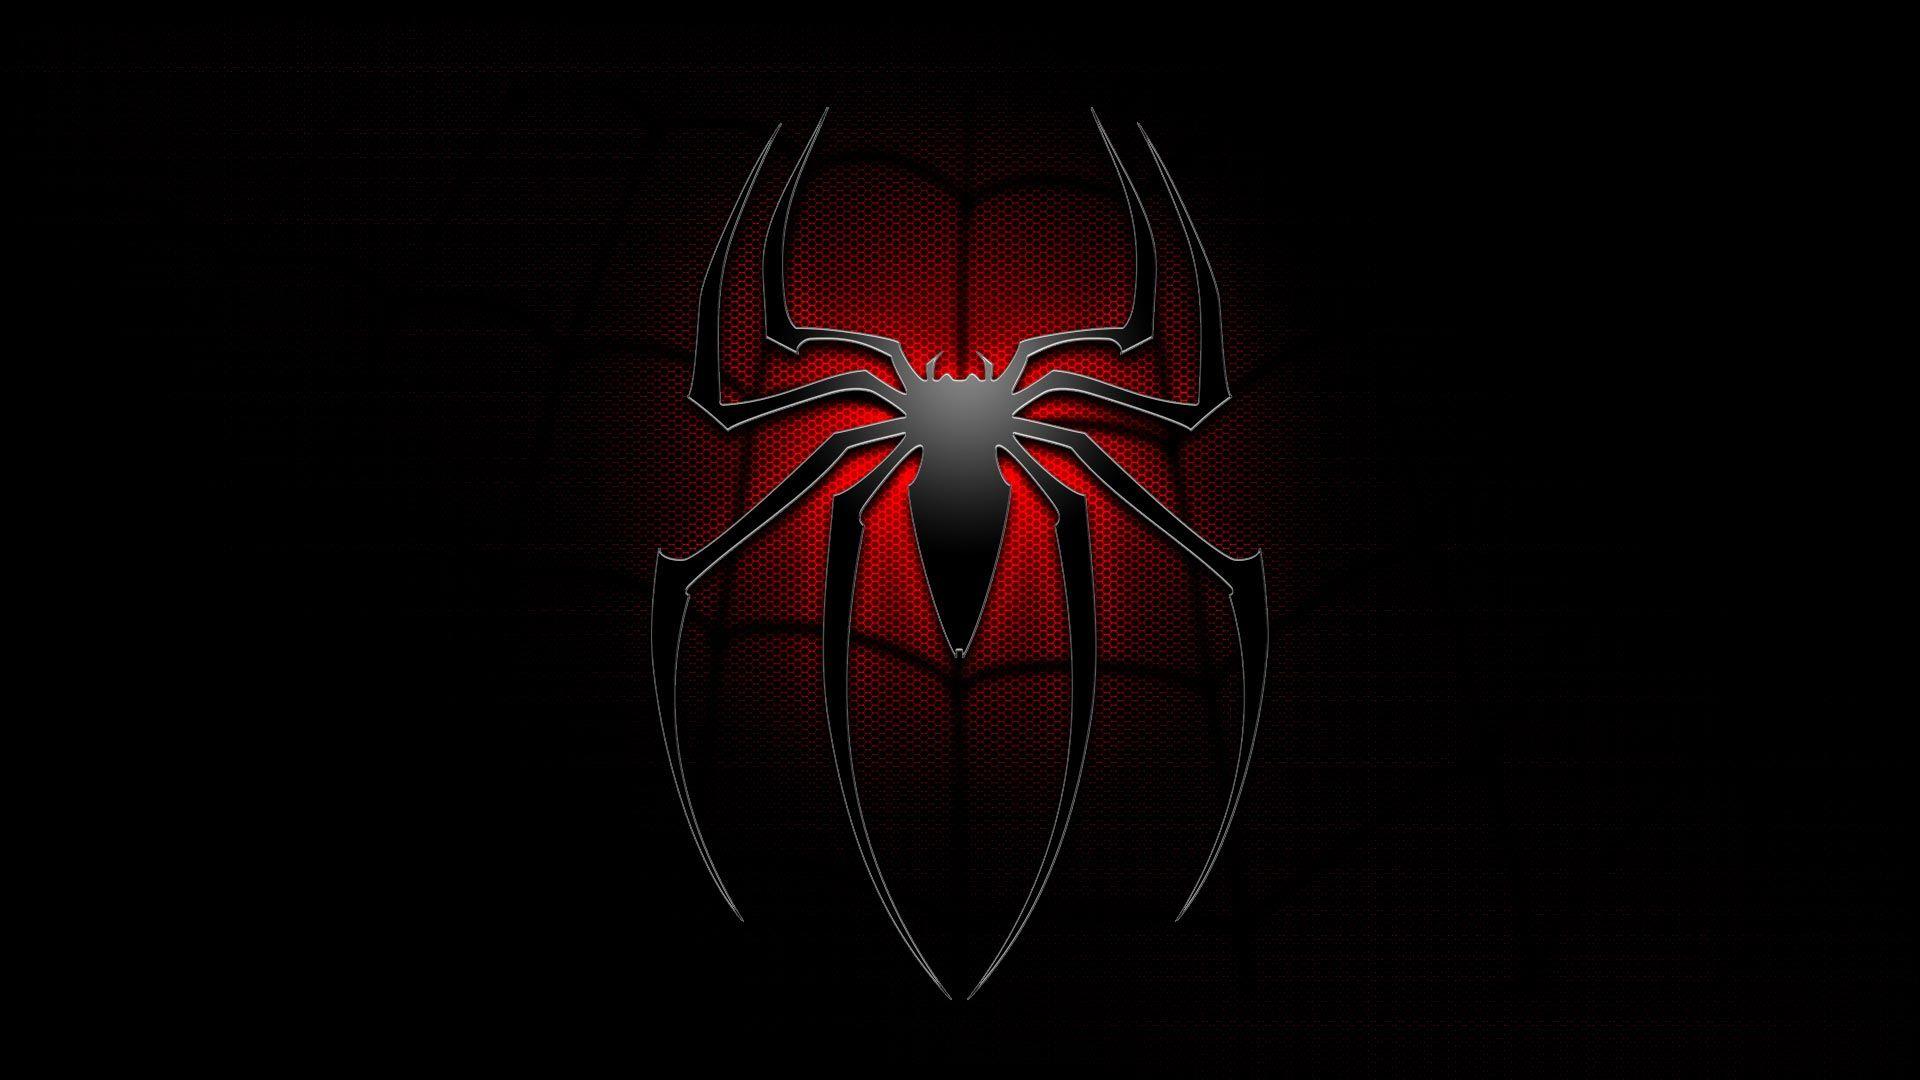 Spiderman Logo Wallpaper 1080p Lxf Amazing Spiderman Spiderman